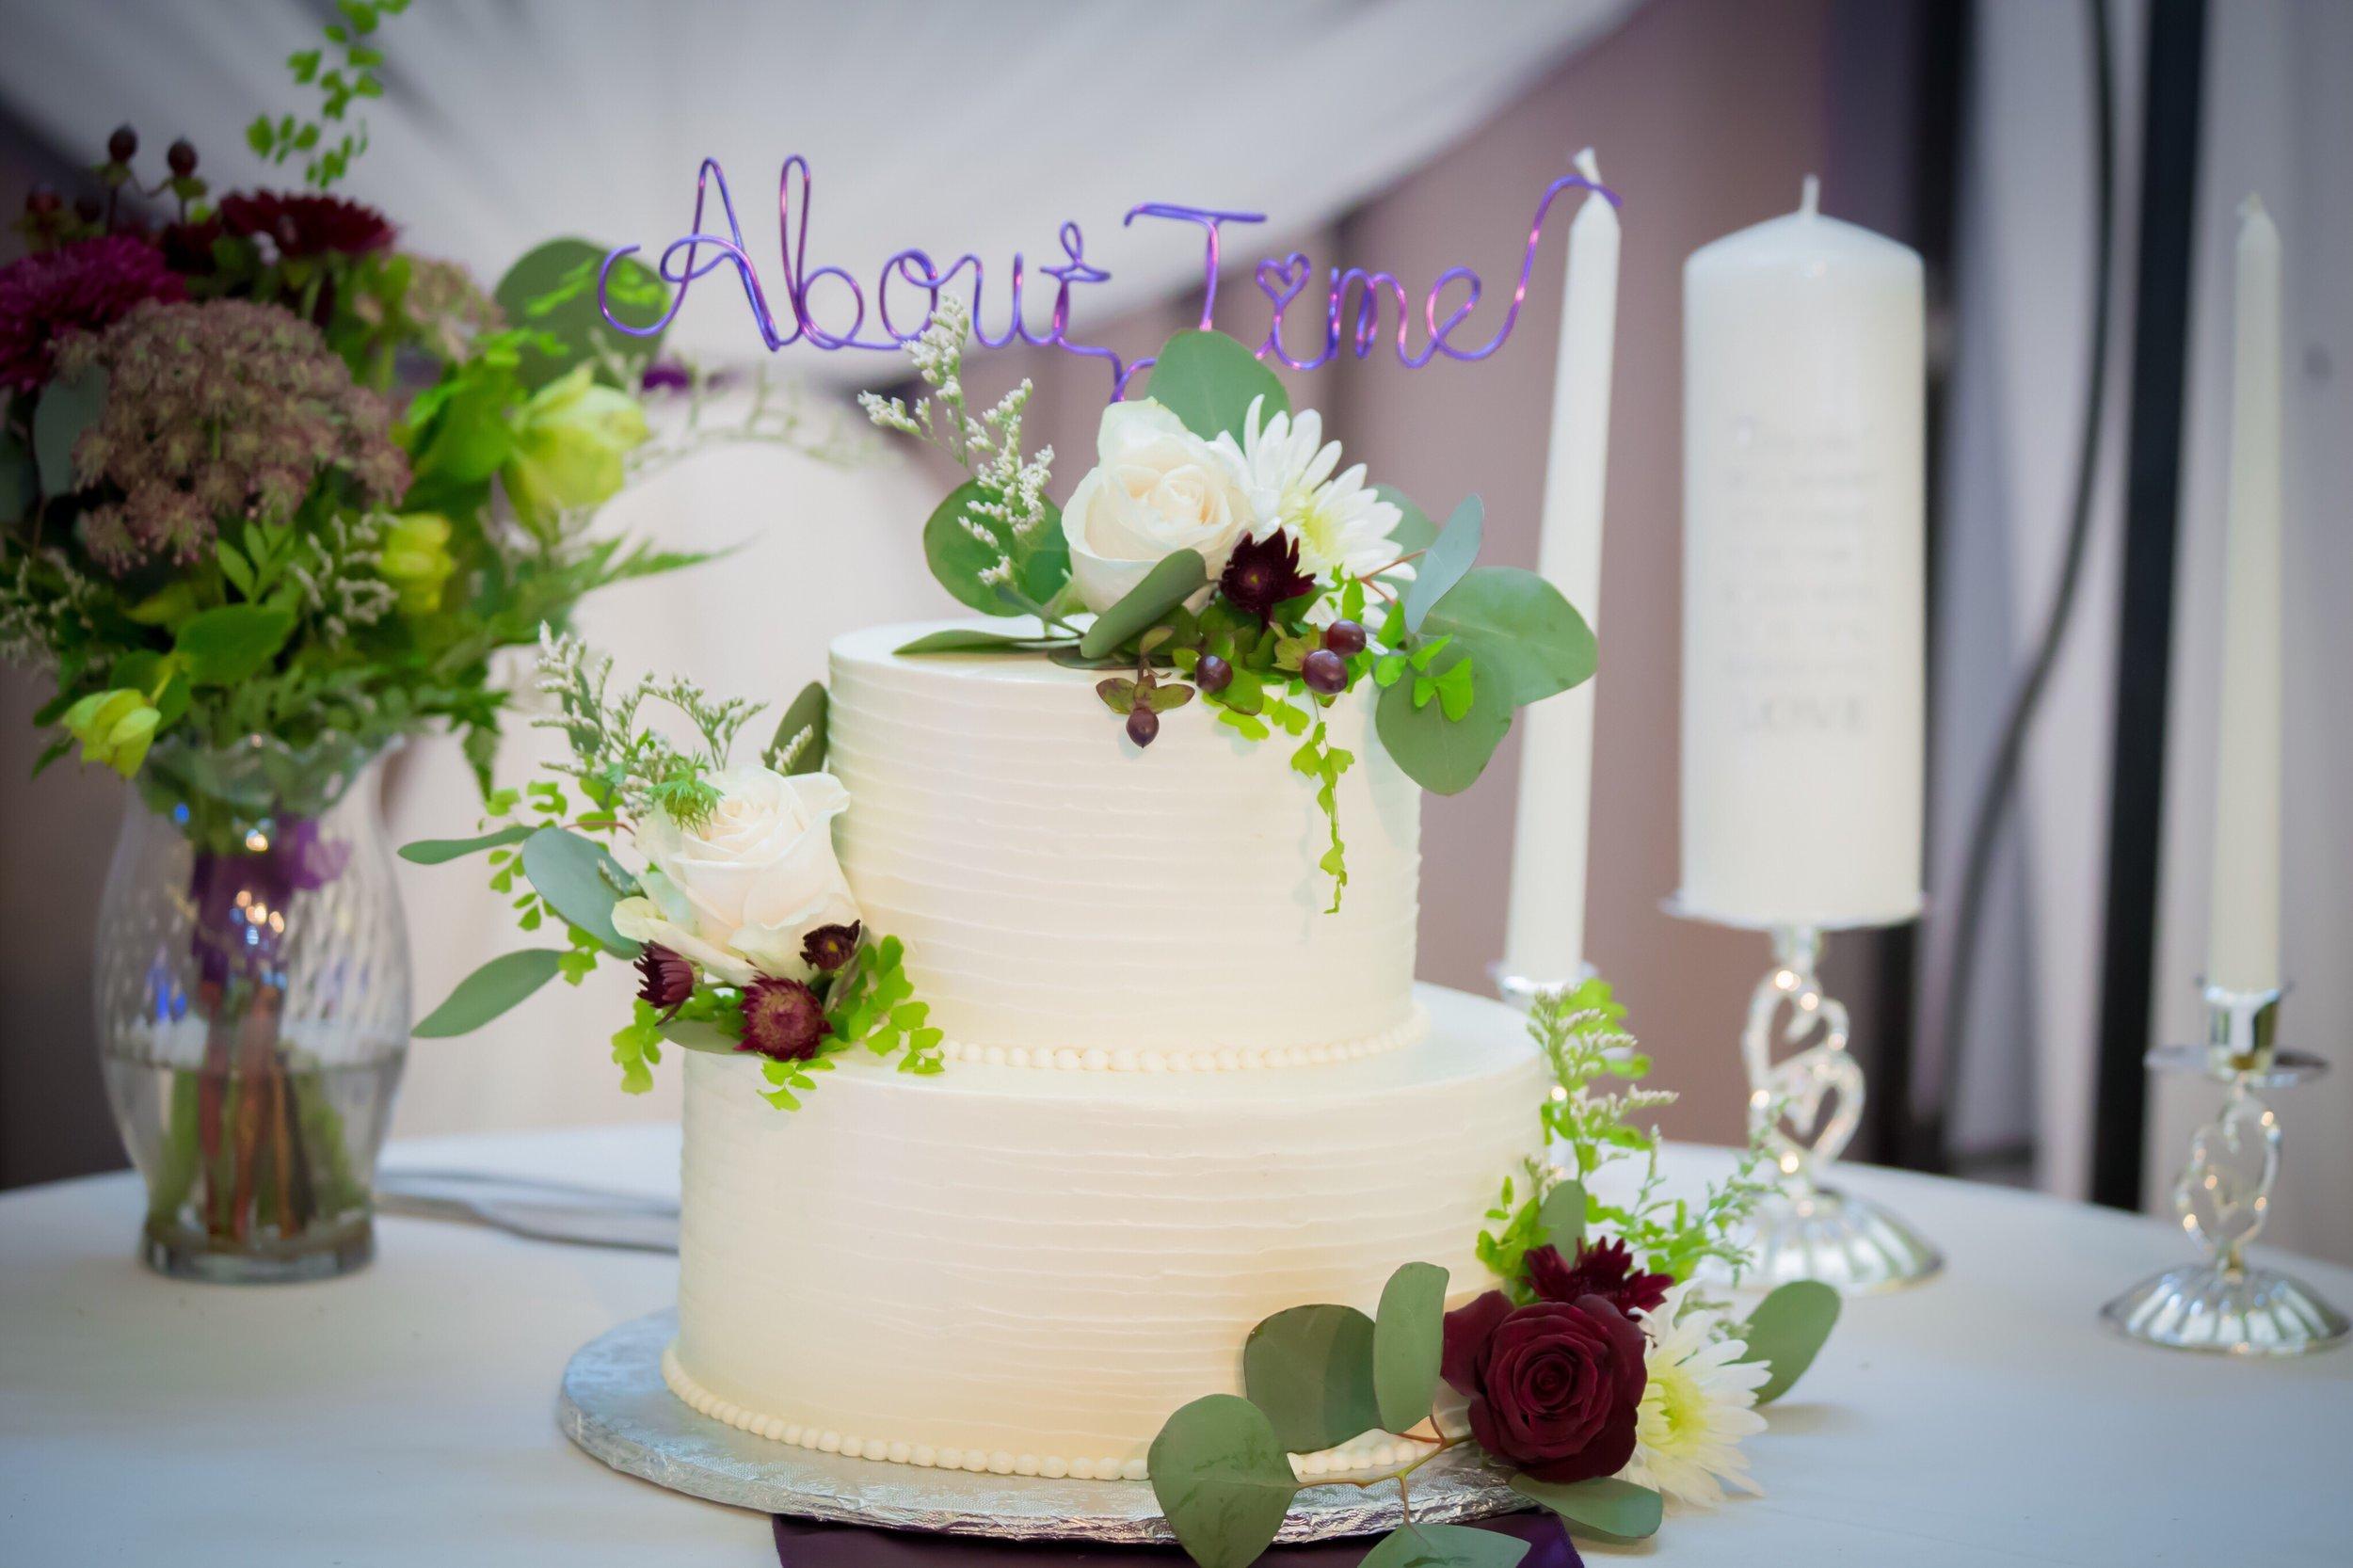 Ruhl wedding cake1.jpeg